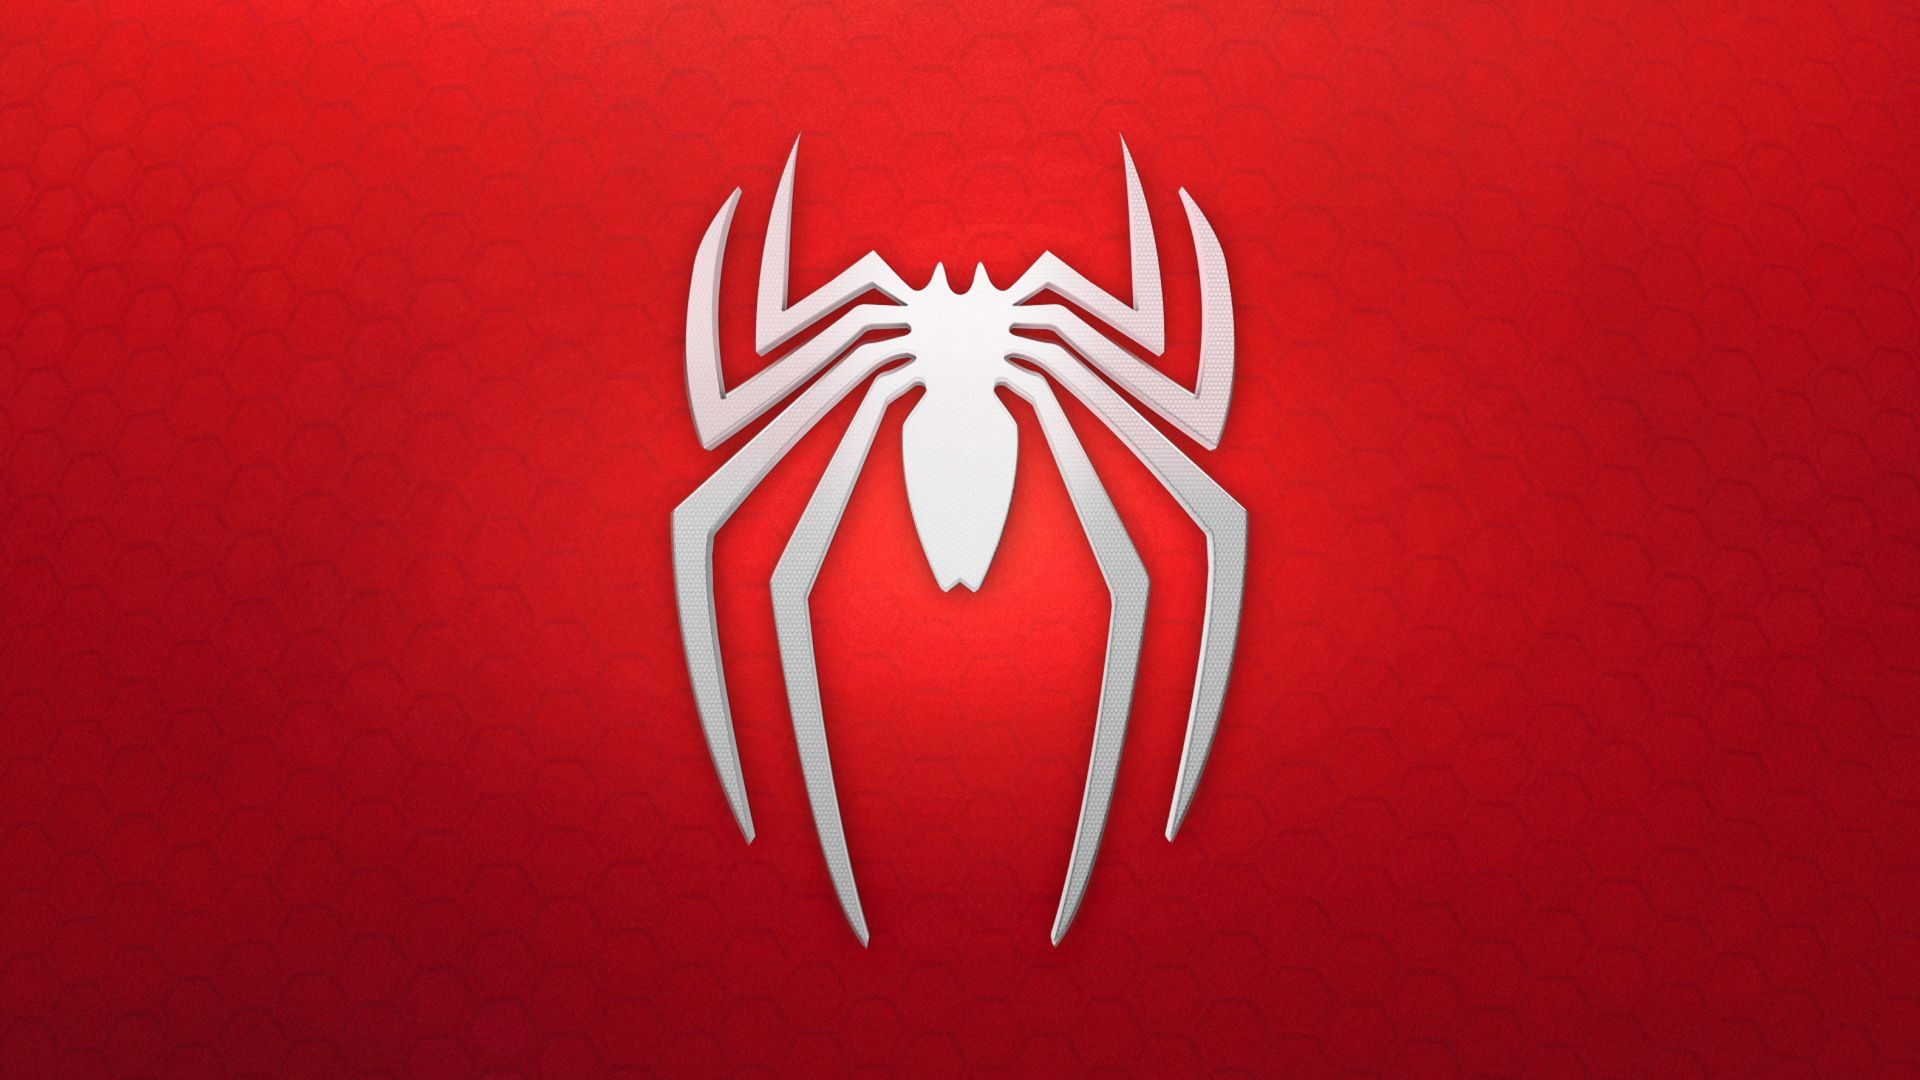 Spiderman Logo Background Red White Horizontal Spiderman Ps4 Wallpaper Spider Man Playstation Spider Man Ps4 Game